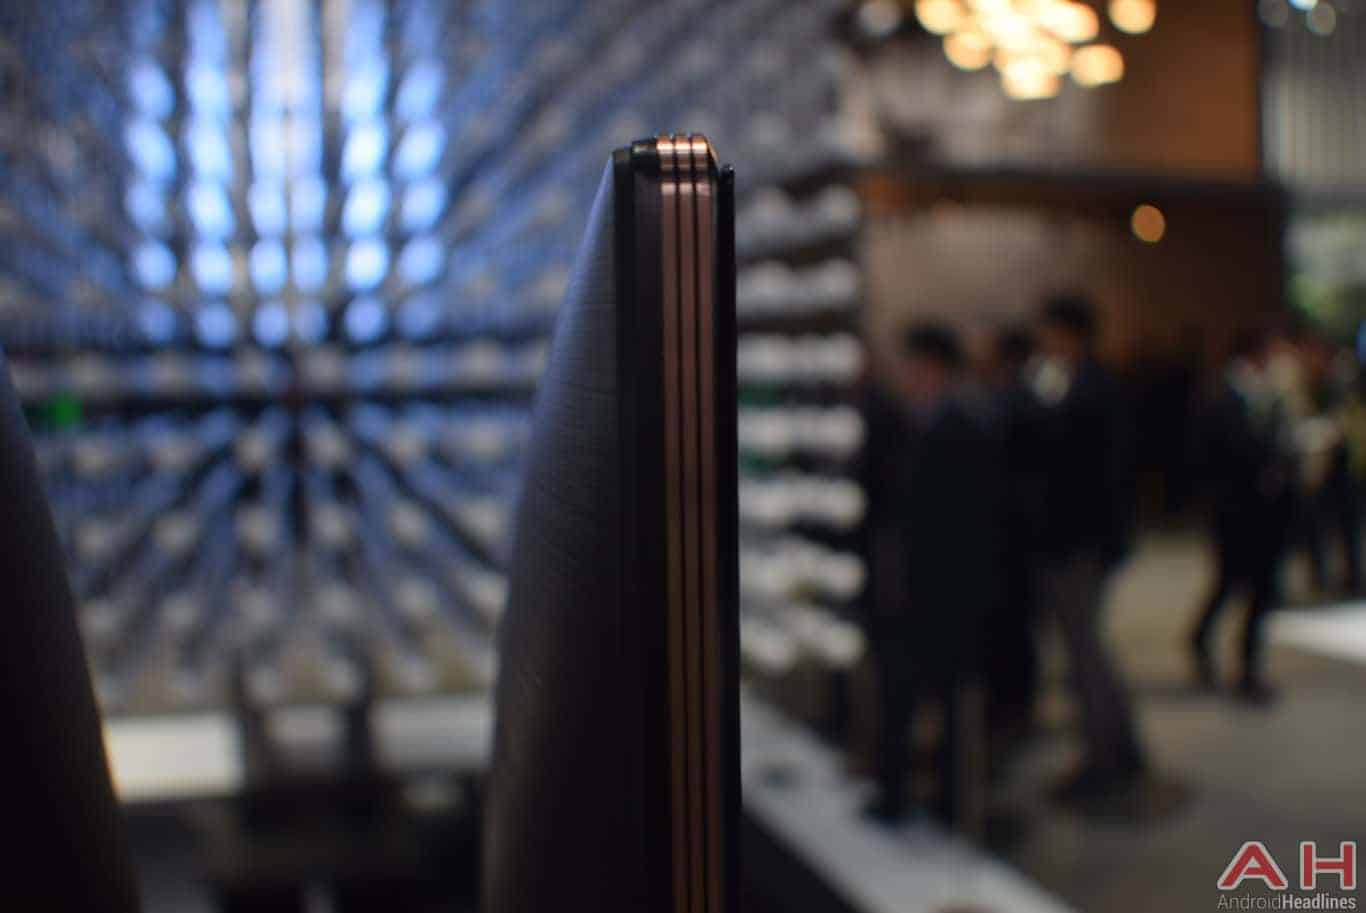 LG Nano Cell TV CES 2018 AH 5